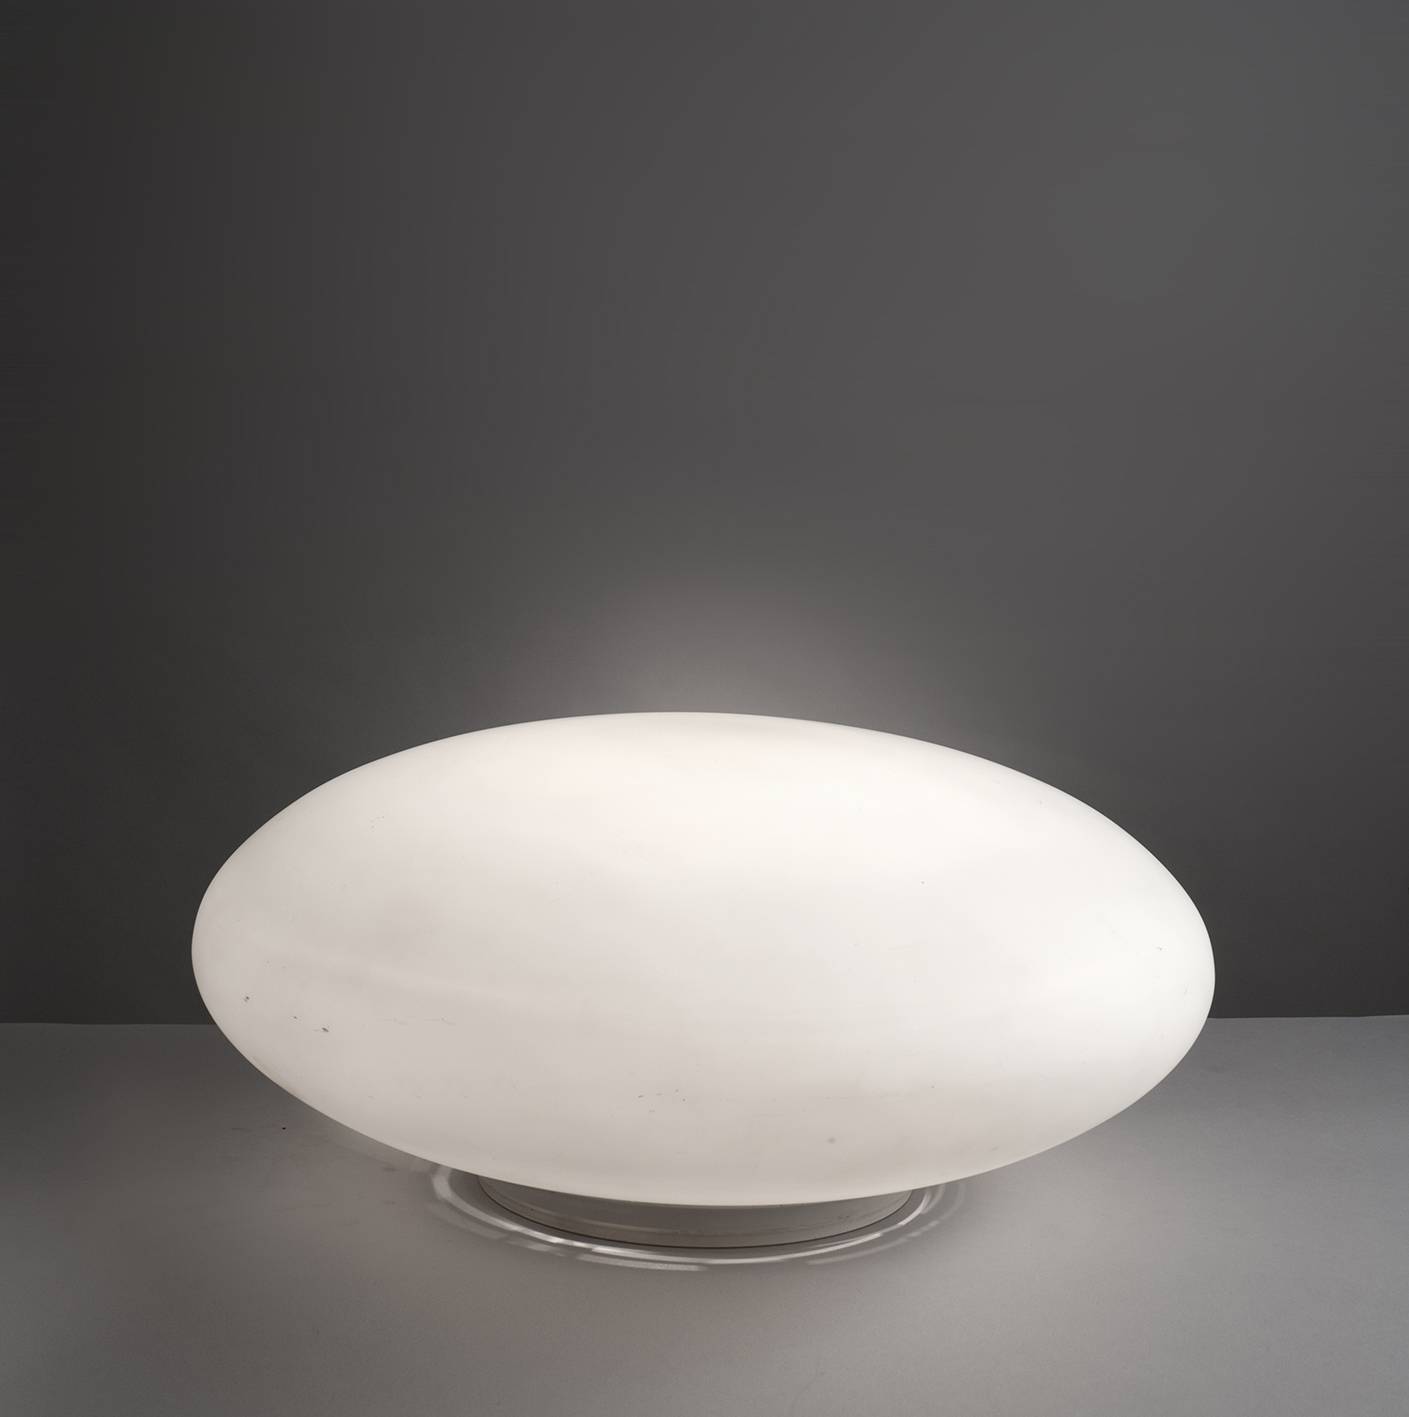 lampe galet mod le 10511 de joseph andr motte. Black Bedroom Furniture Sets. Home Design Ideas